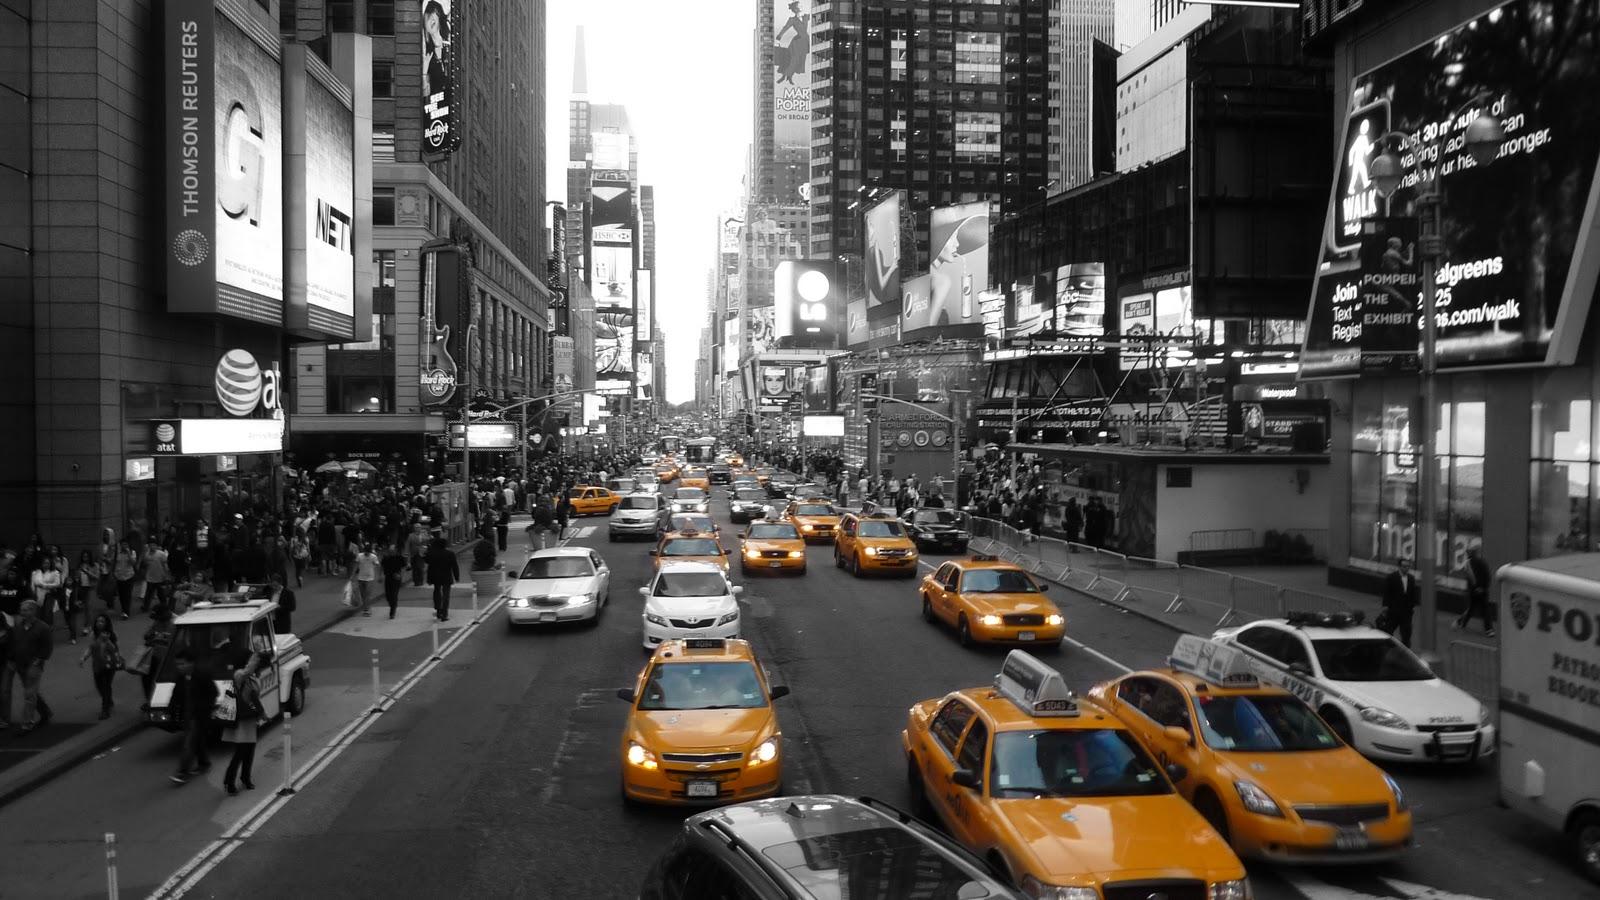 New York City Black And White Wallpaper Free Hd Aiinshahri